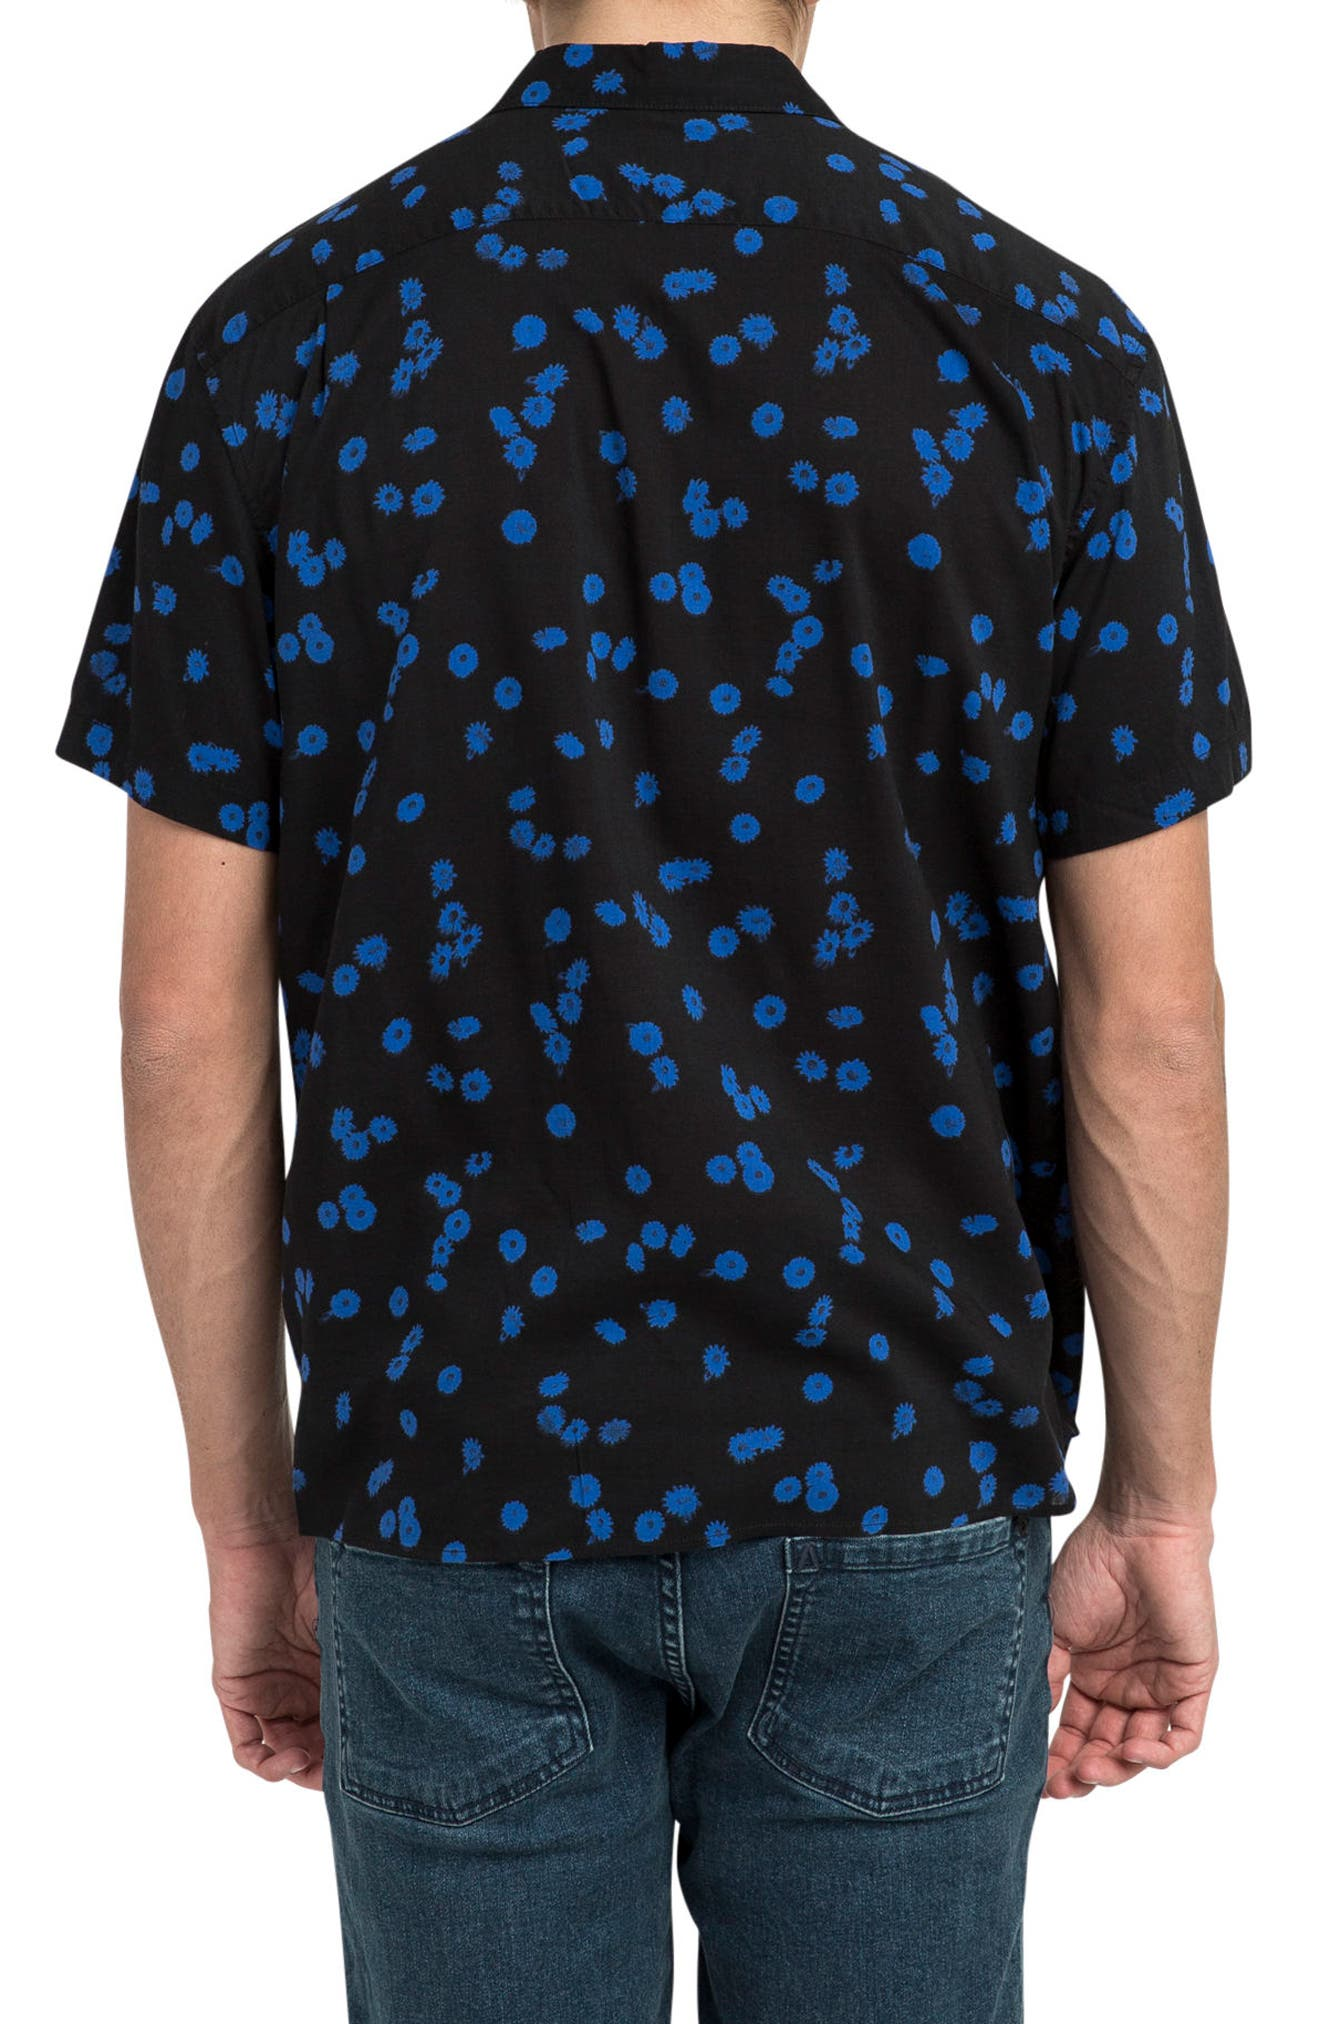 Overdye Floral Shirt,                             Alternate thumbnail 2, color,                             001